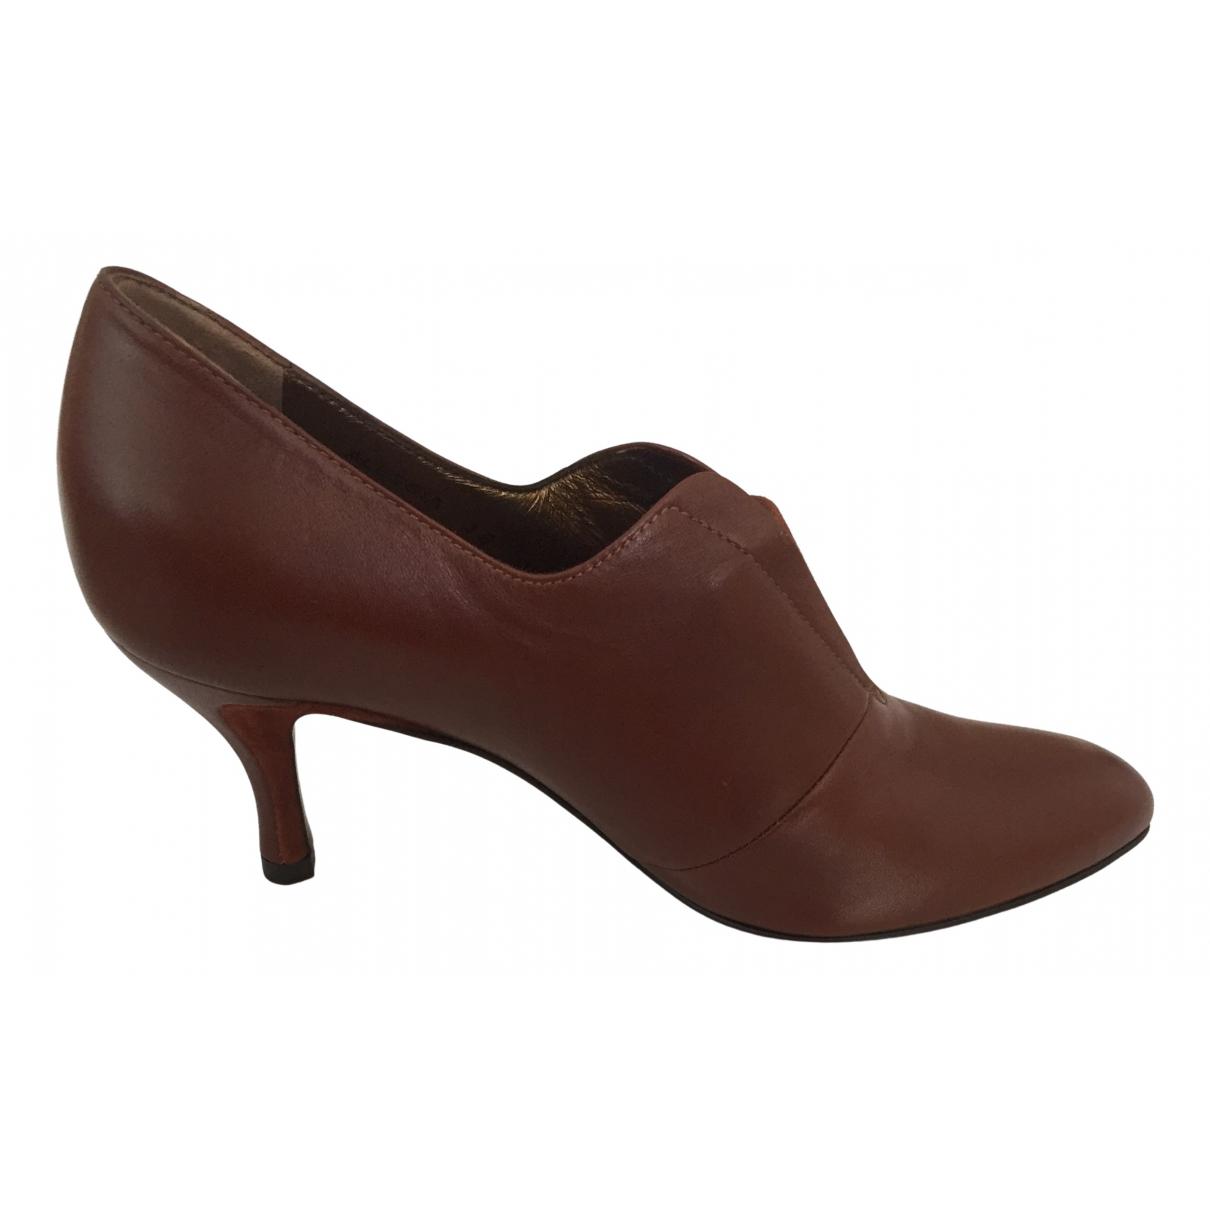 Bally \N Camel Leather Heels for Women 36 EU